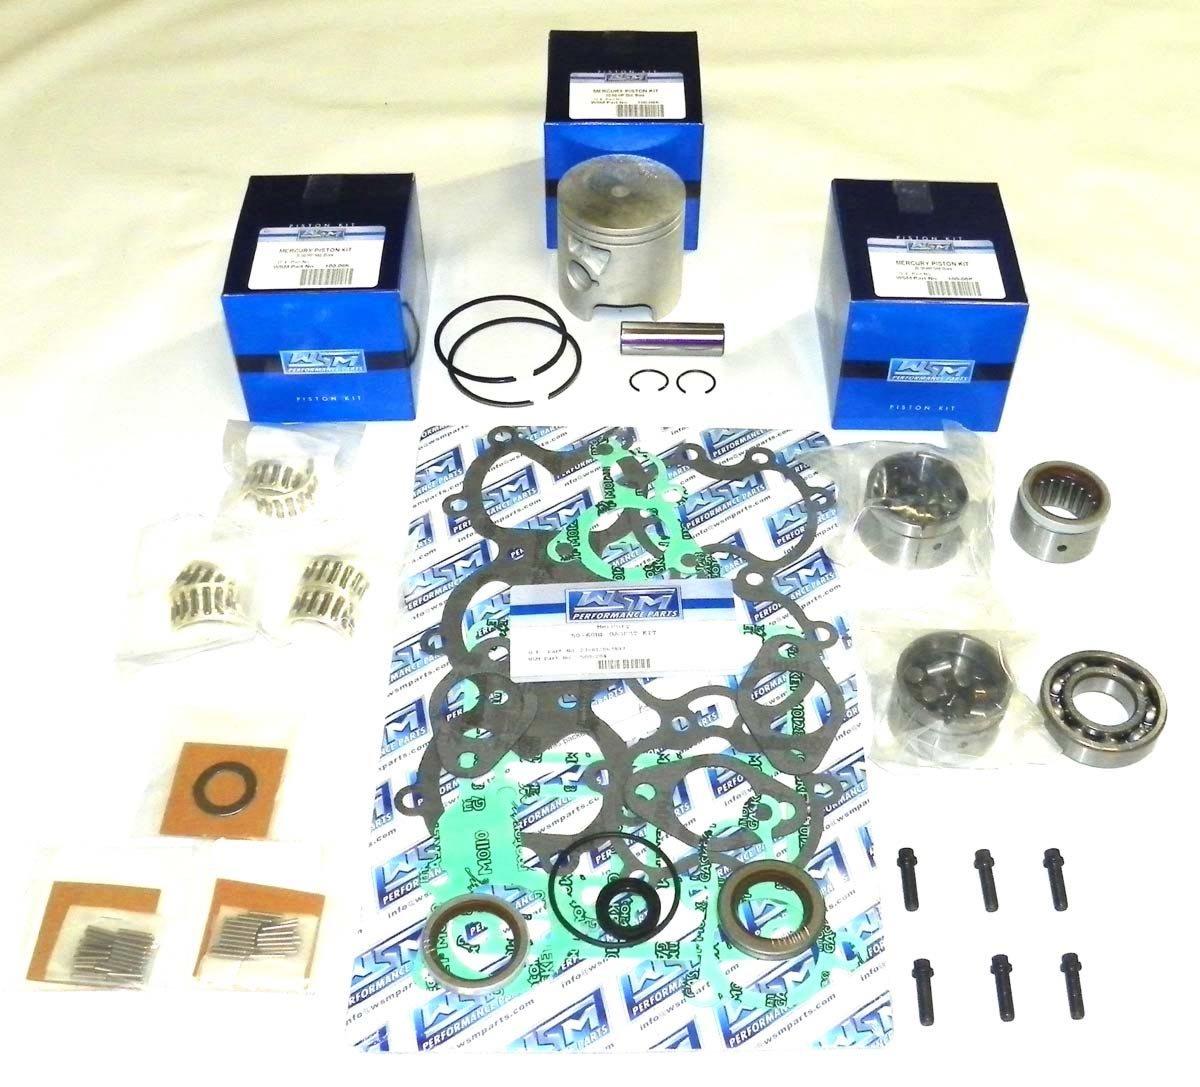 Mercury 50 & 60 Hp 1991-1997 3 Cylinder Power Head Rebuild Kit PWC 100-07-10 Piston OEM# 783-9613A 1, 783-9613T 1 (.015'' (3.010''))